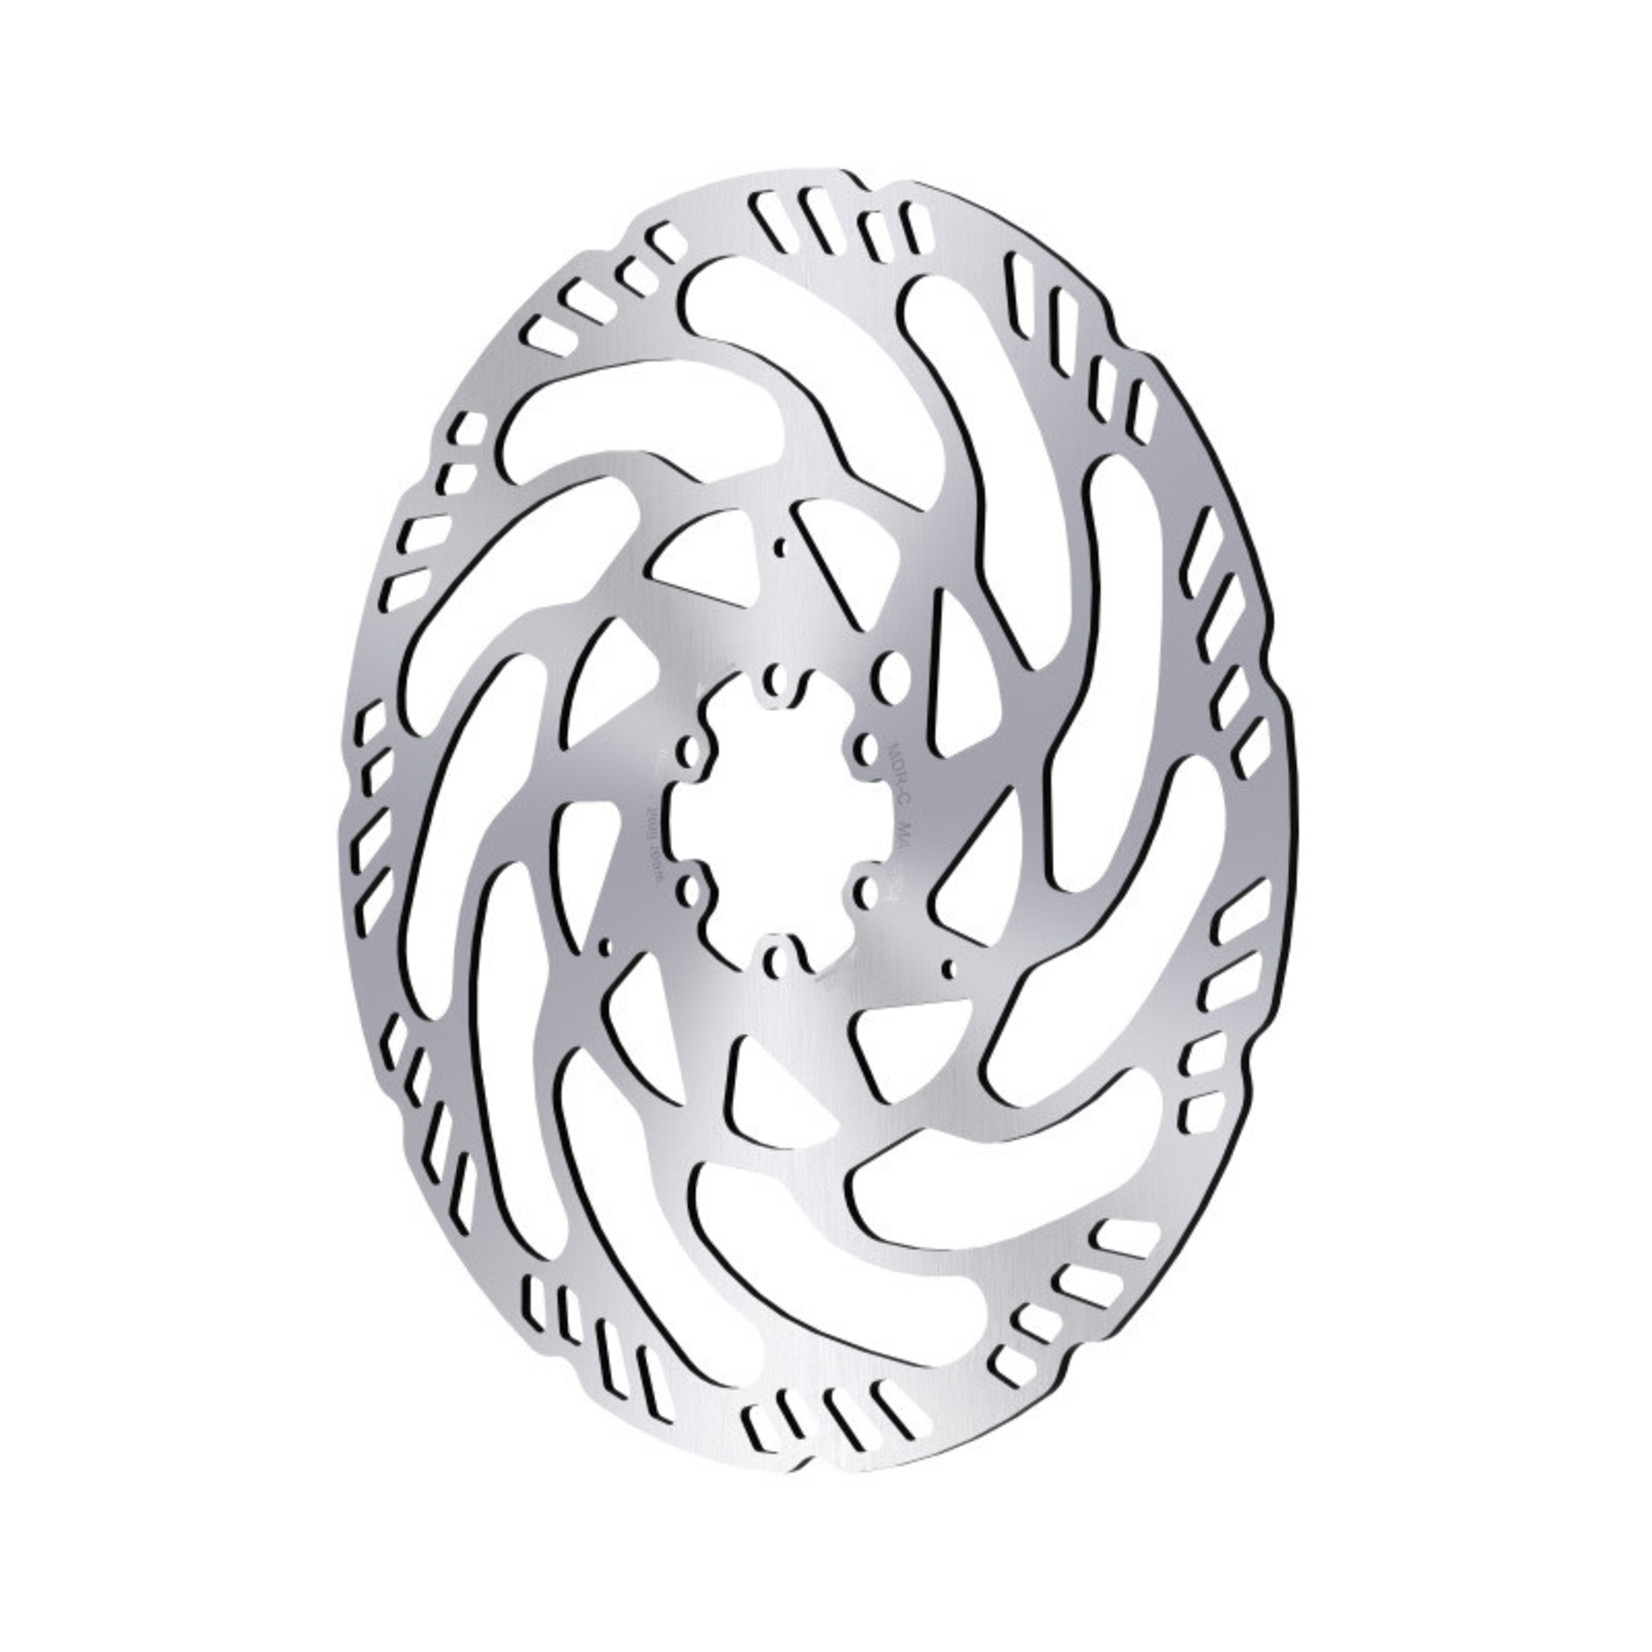 Magura Magura - disco del freno 203 mm 6 viti